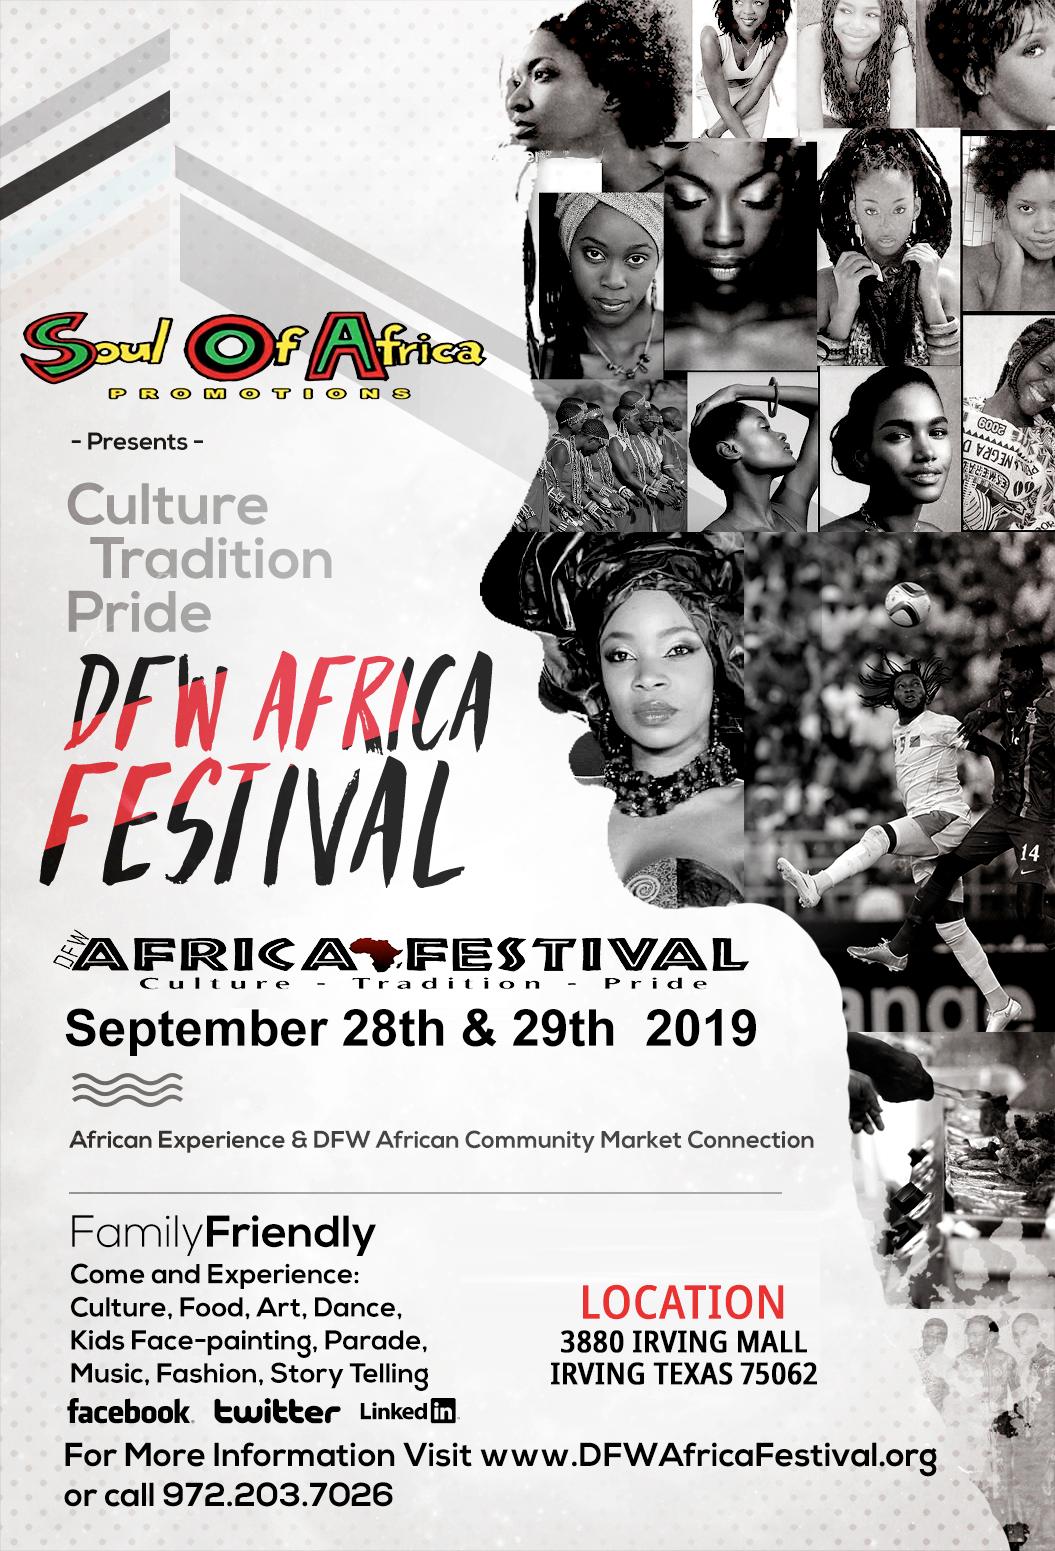 DFW Africa Festival of 2019